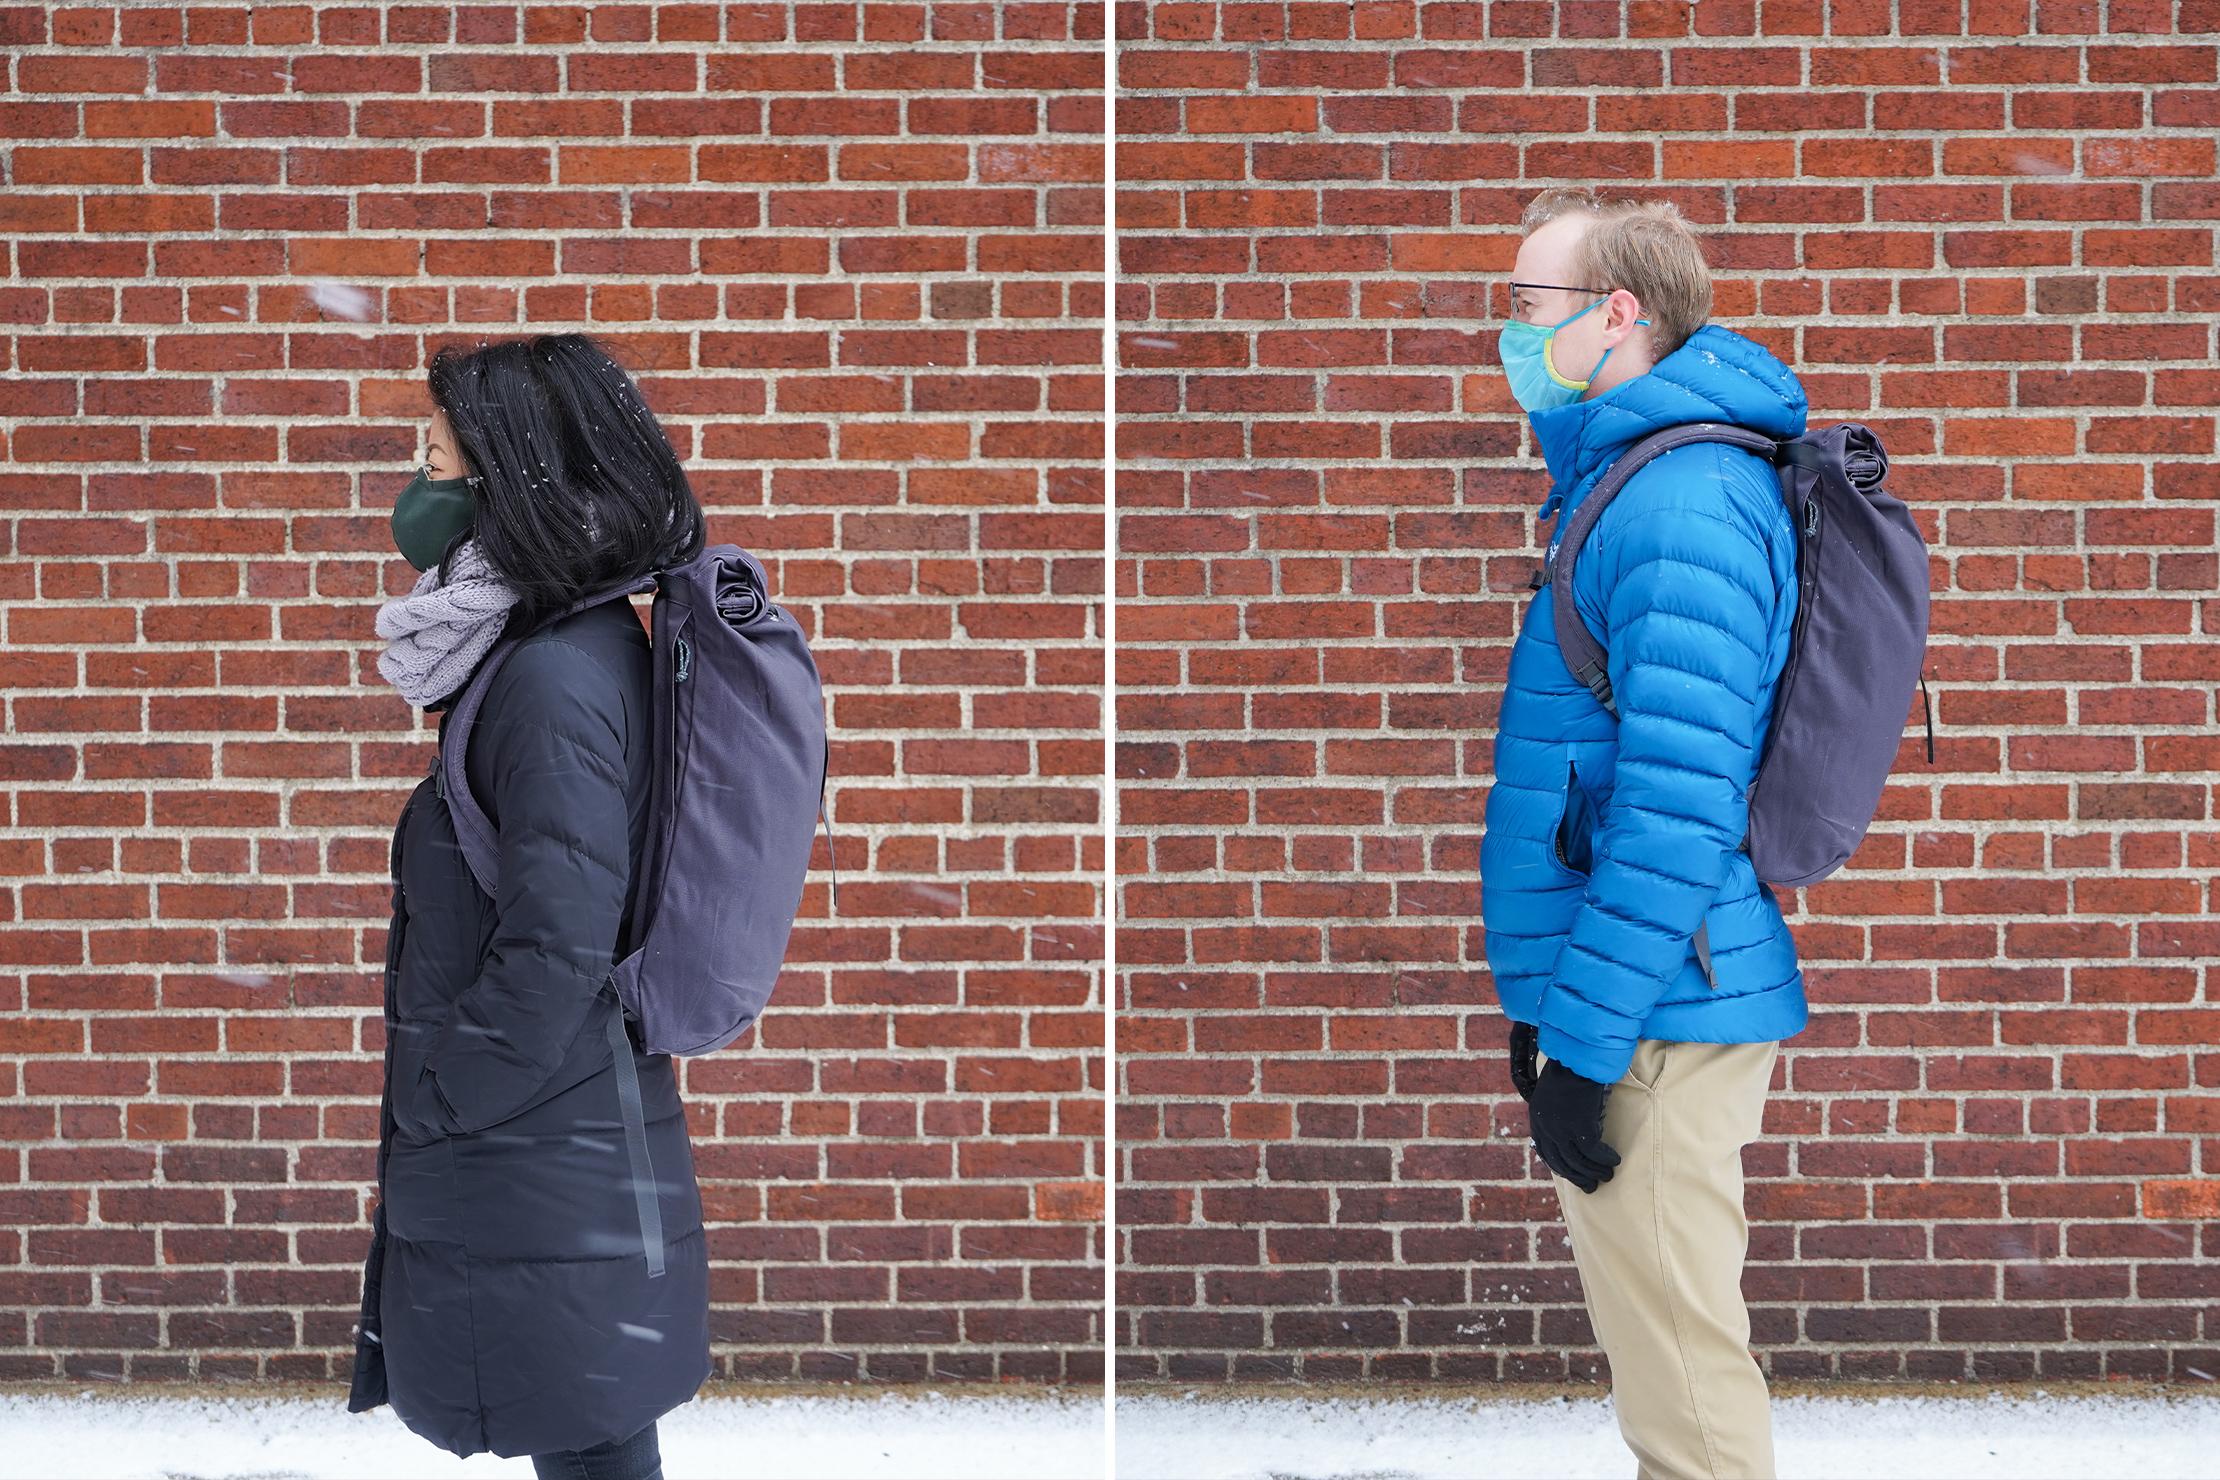 "Left: Lauren, Height, 5'3"" (160 cm), Torso: 17"" (43 cm)   Right: Mark, Height, 5'10"" (178 cm), Torso: 19"" (48 cm)"